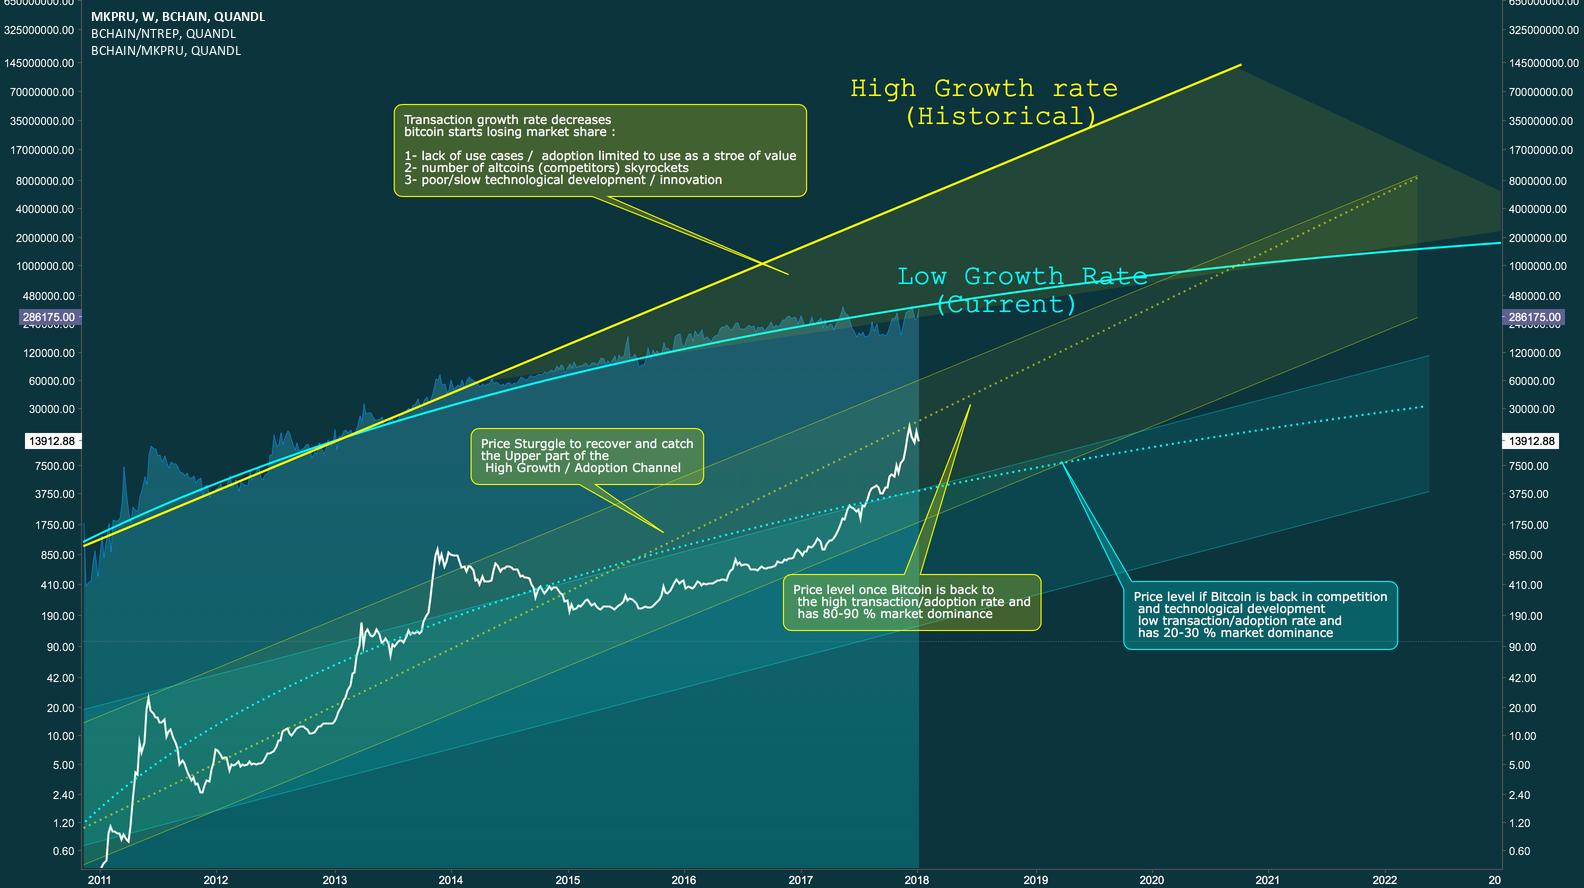 Bitcoin Adoption Price & Transaction Volume